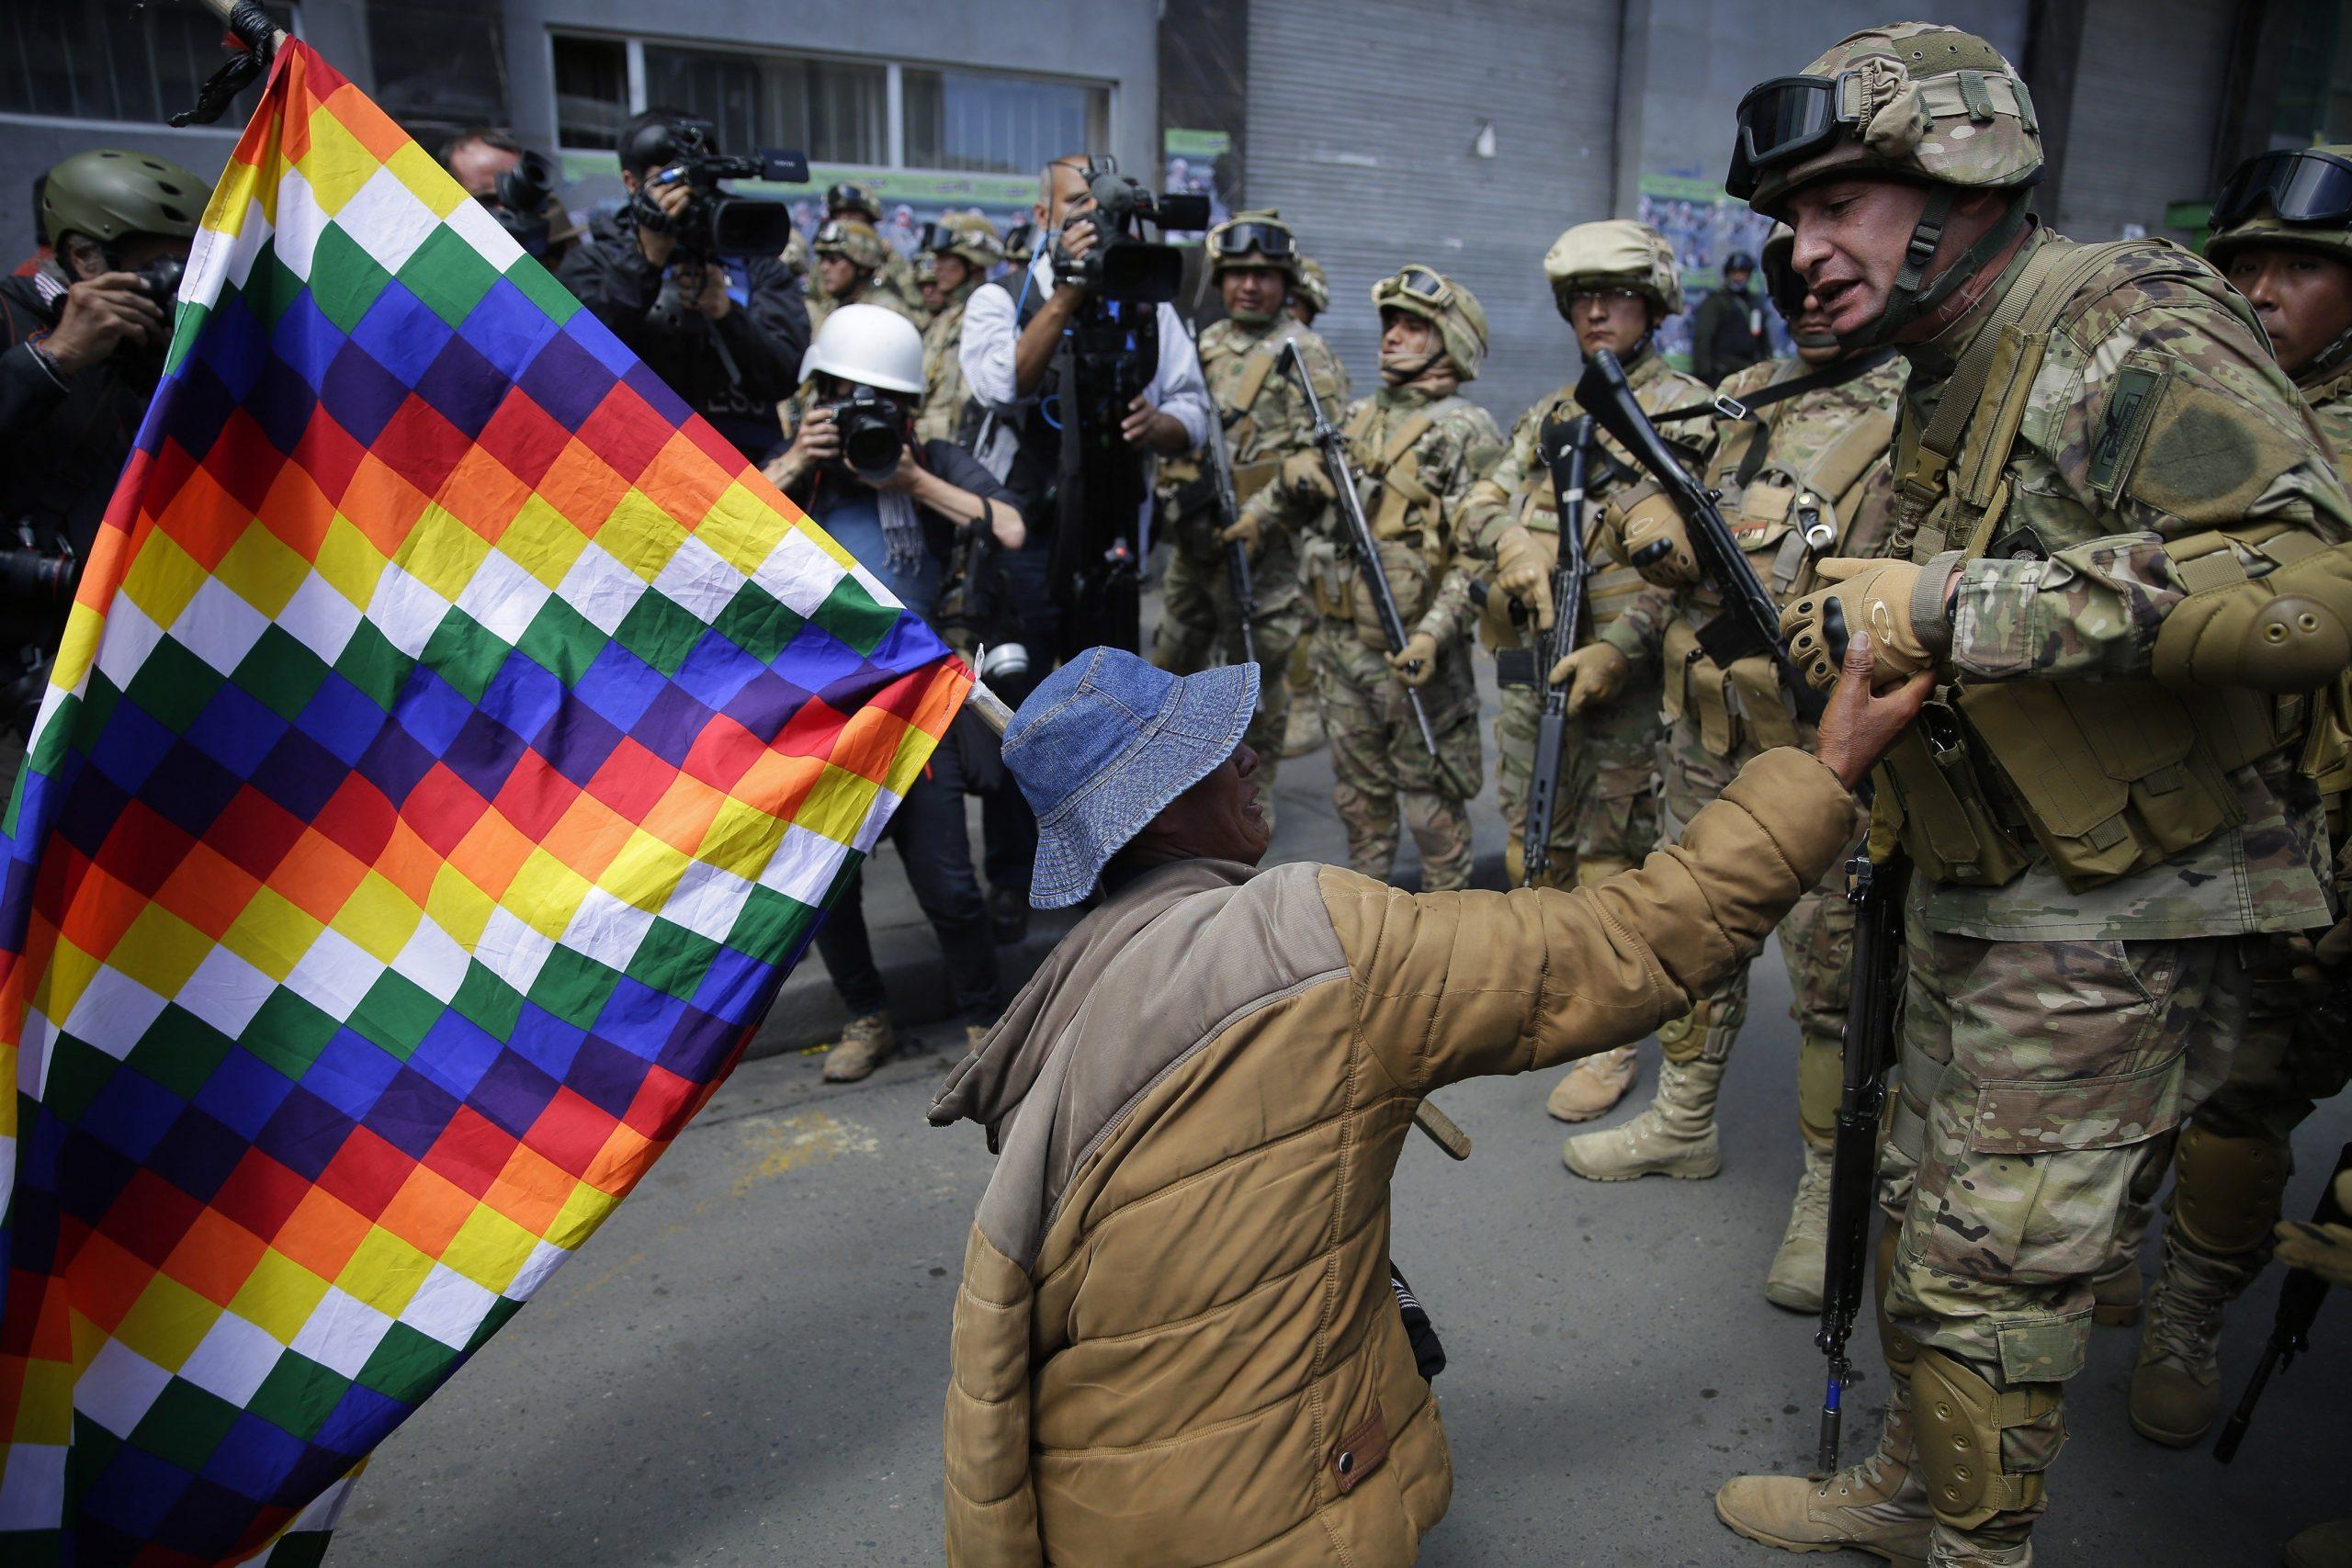 Hijos de Evo Morales llegan a Argentina